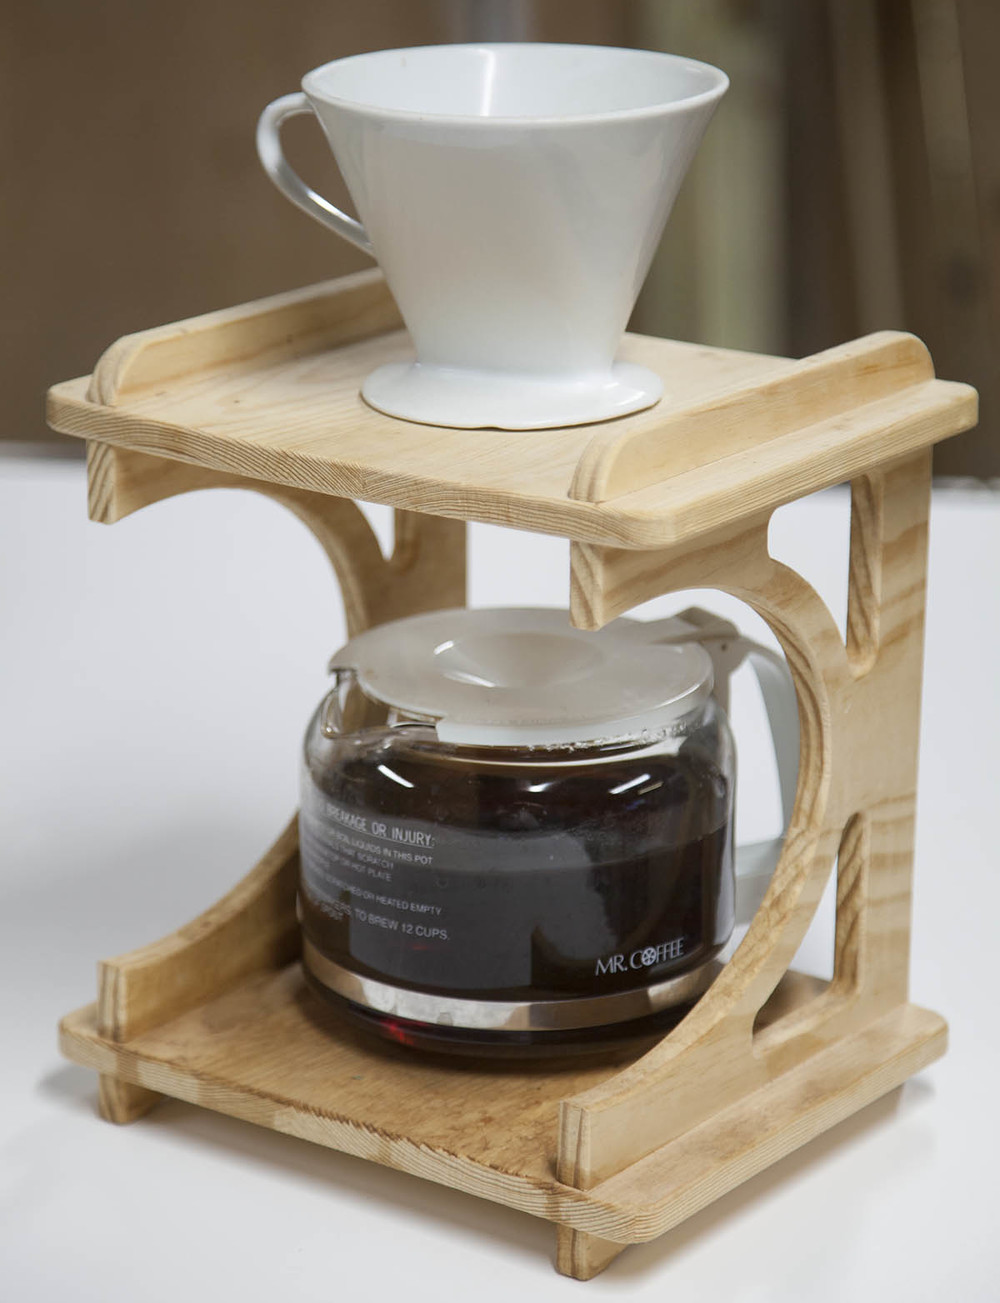 Best Coffee Maker Pour Over : Pour Over Coffee Maker Kronos Robotics